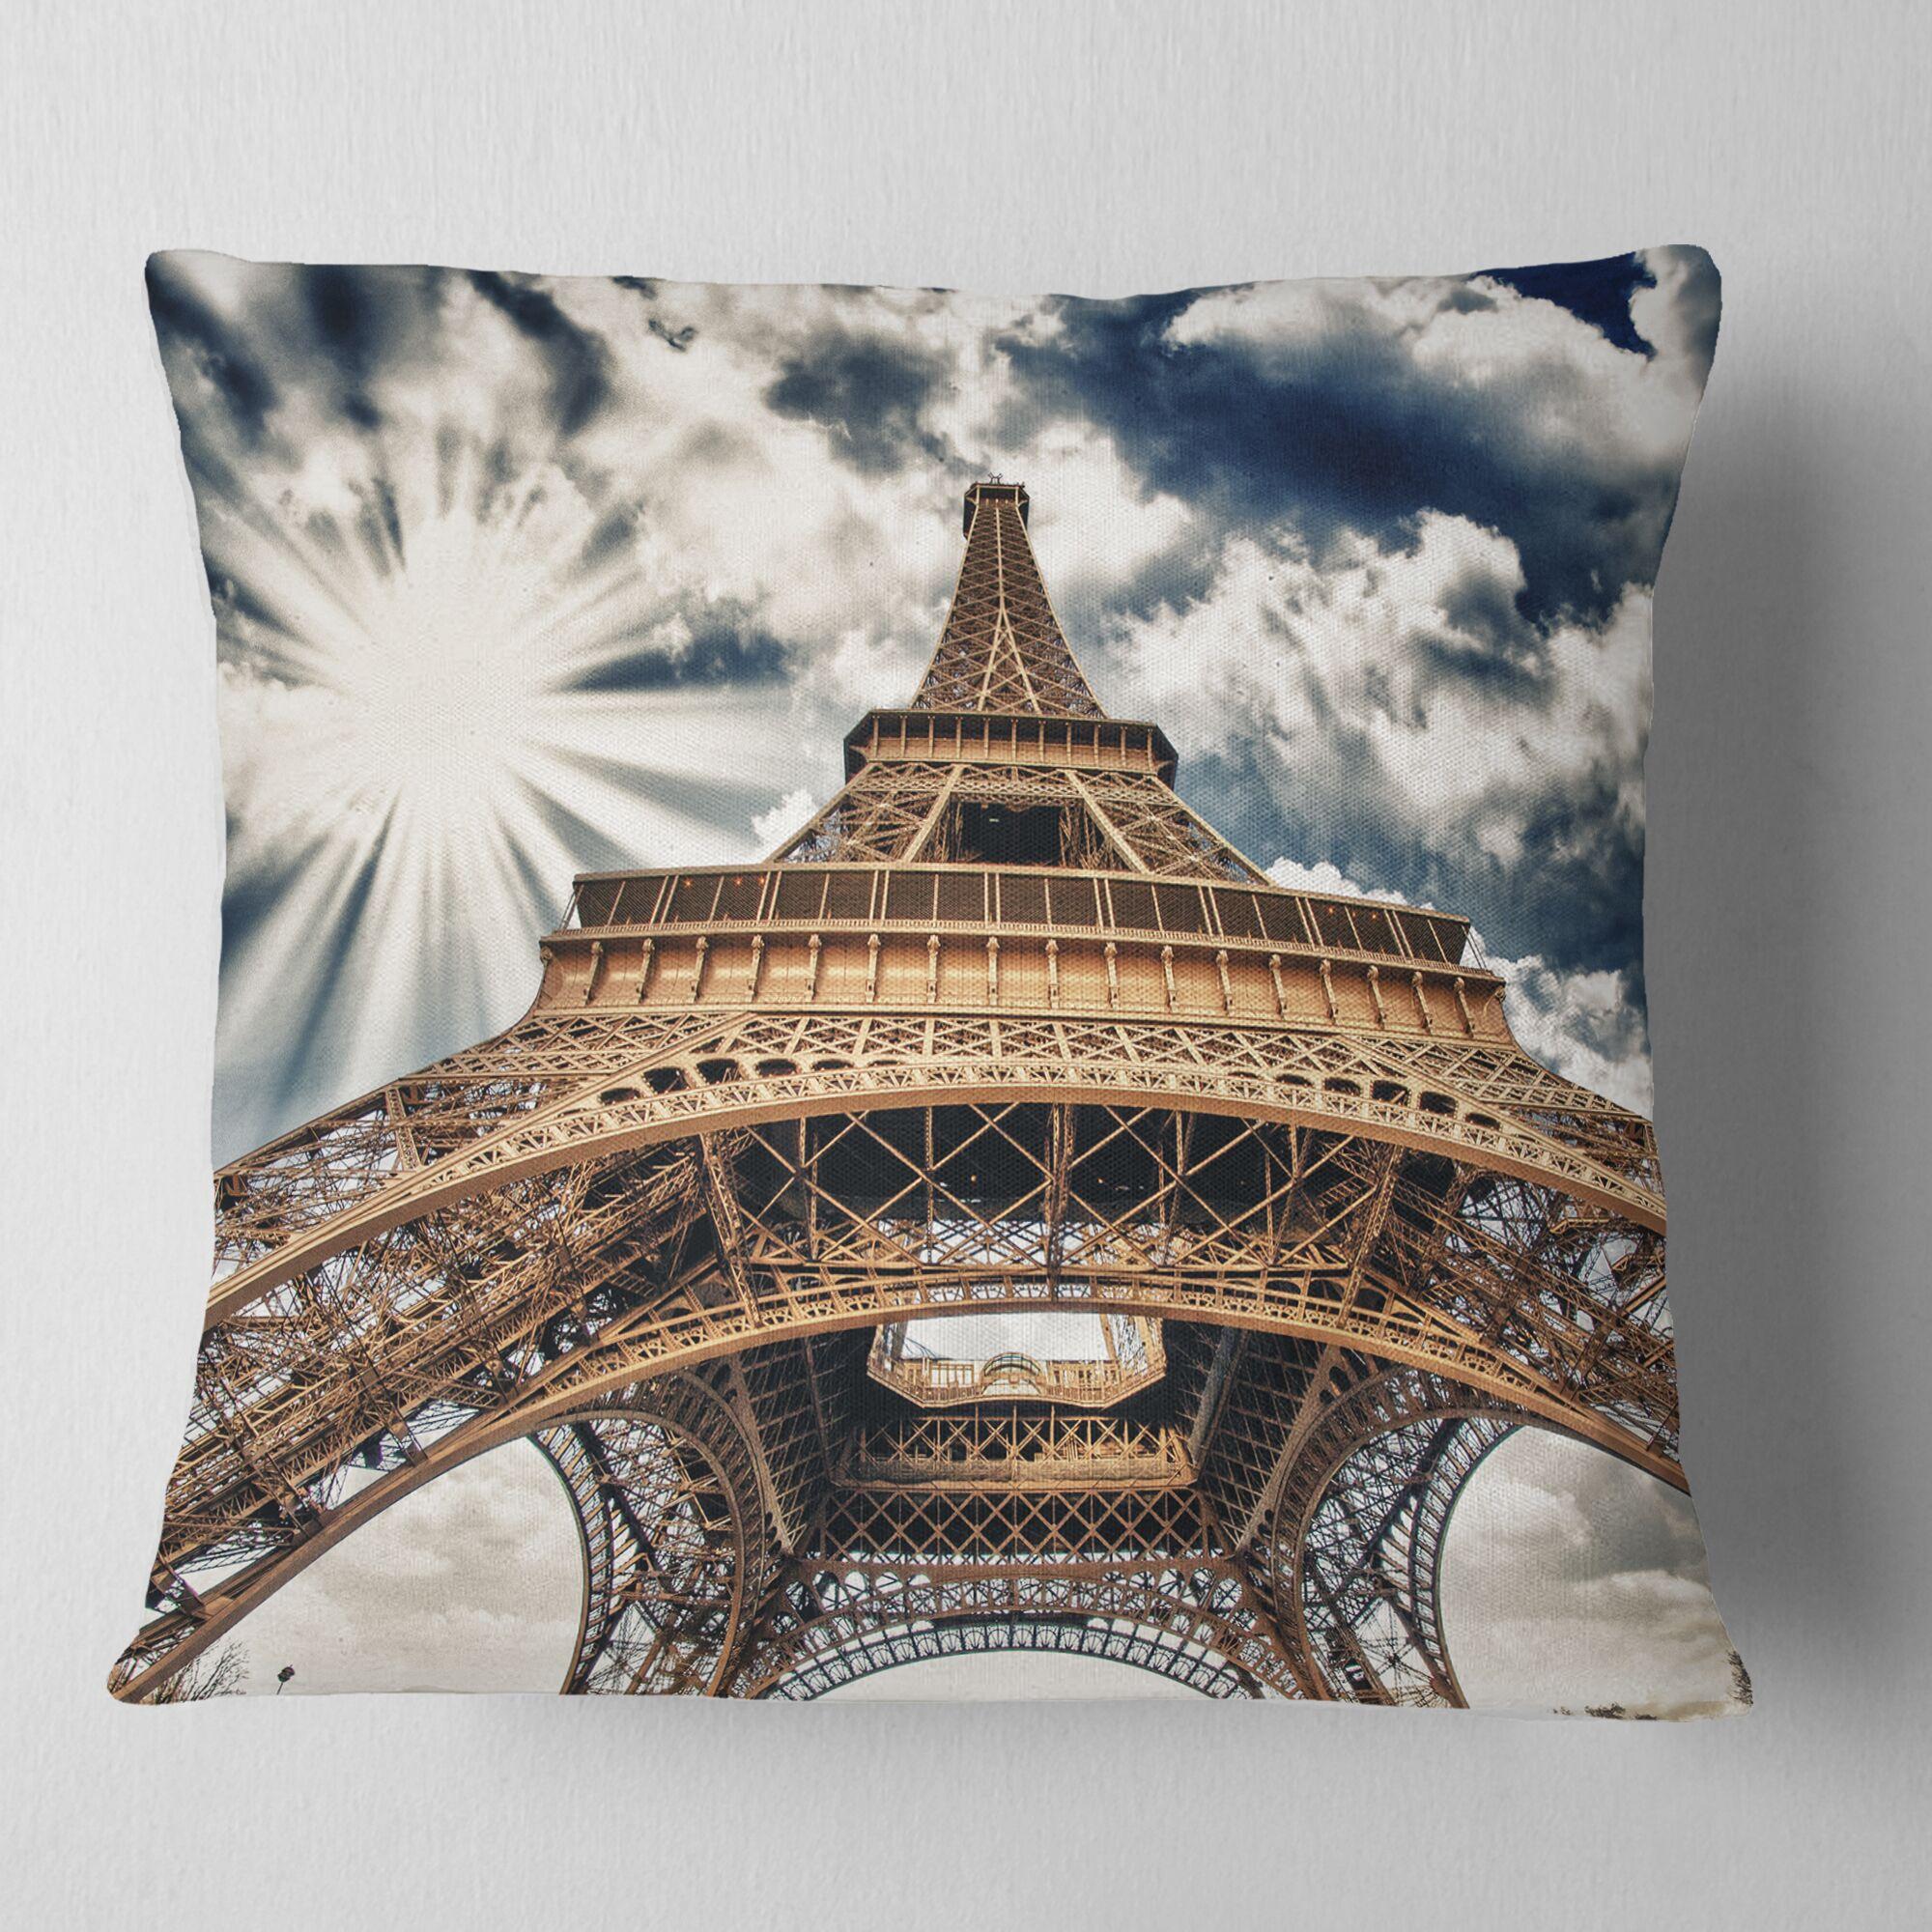 Cityscape Fisheye View of Paris Eiffel Tower Pillow Size: 18